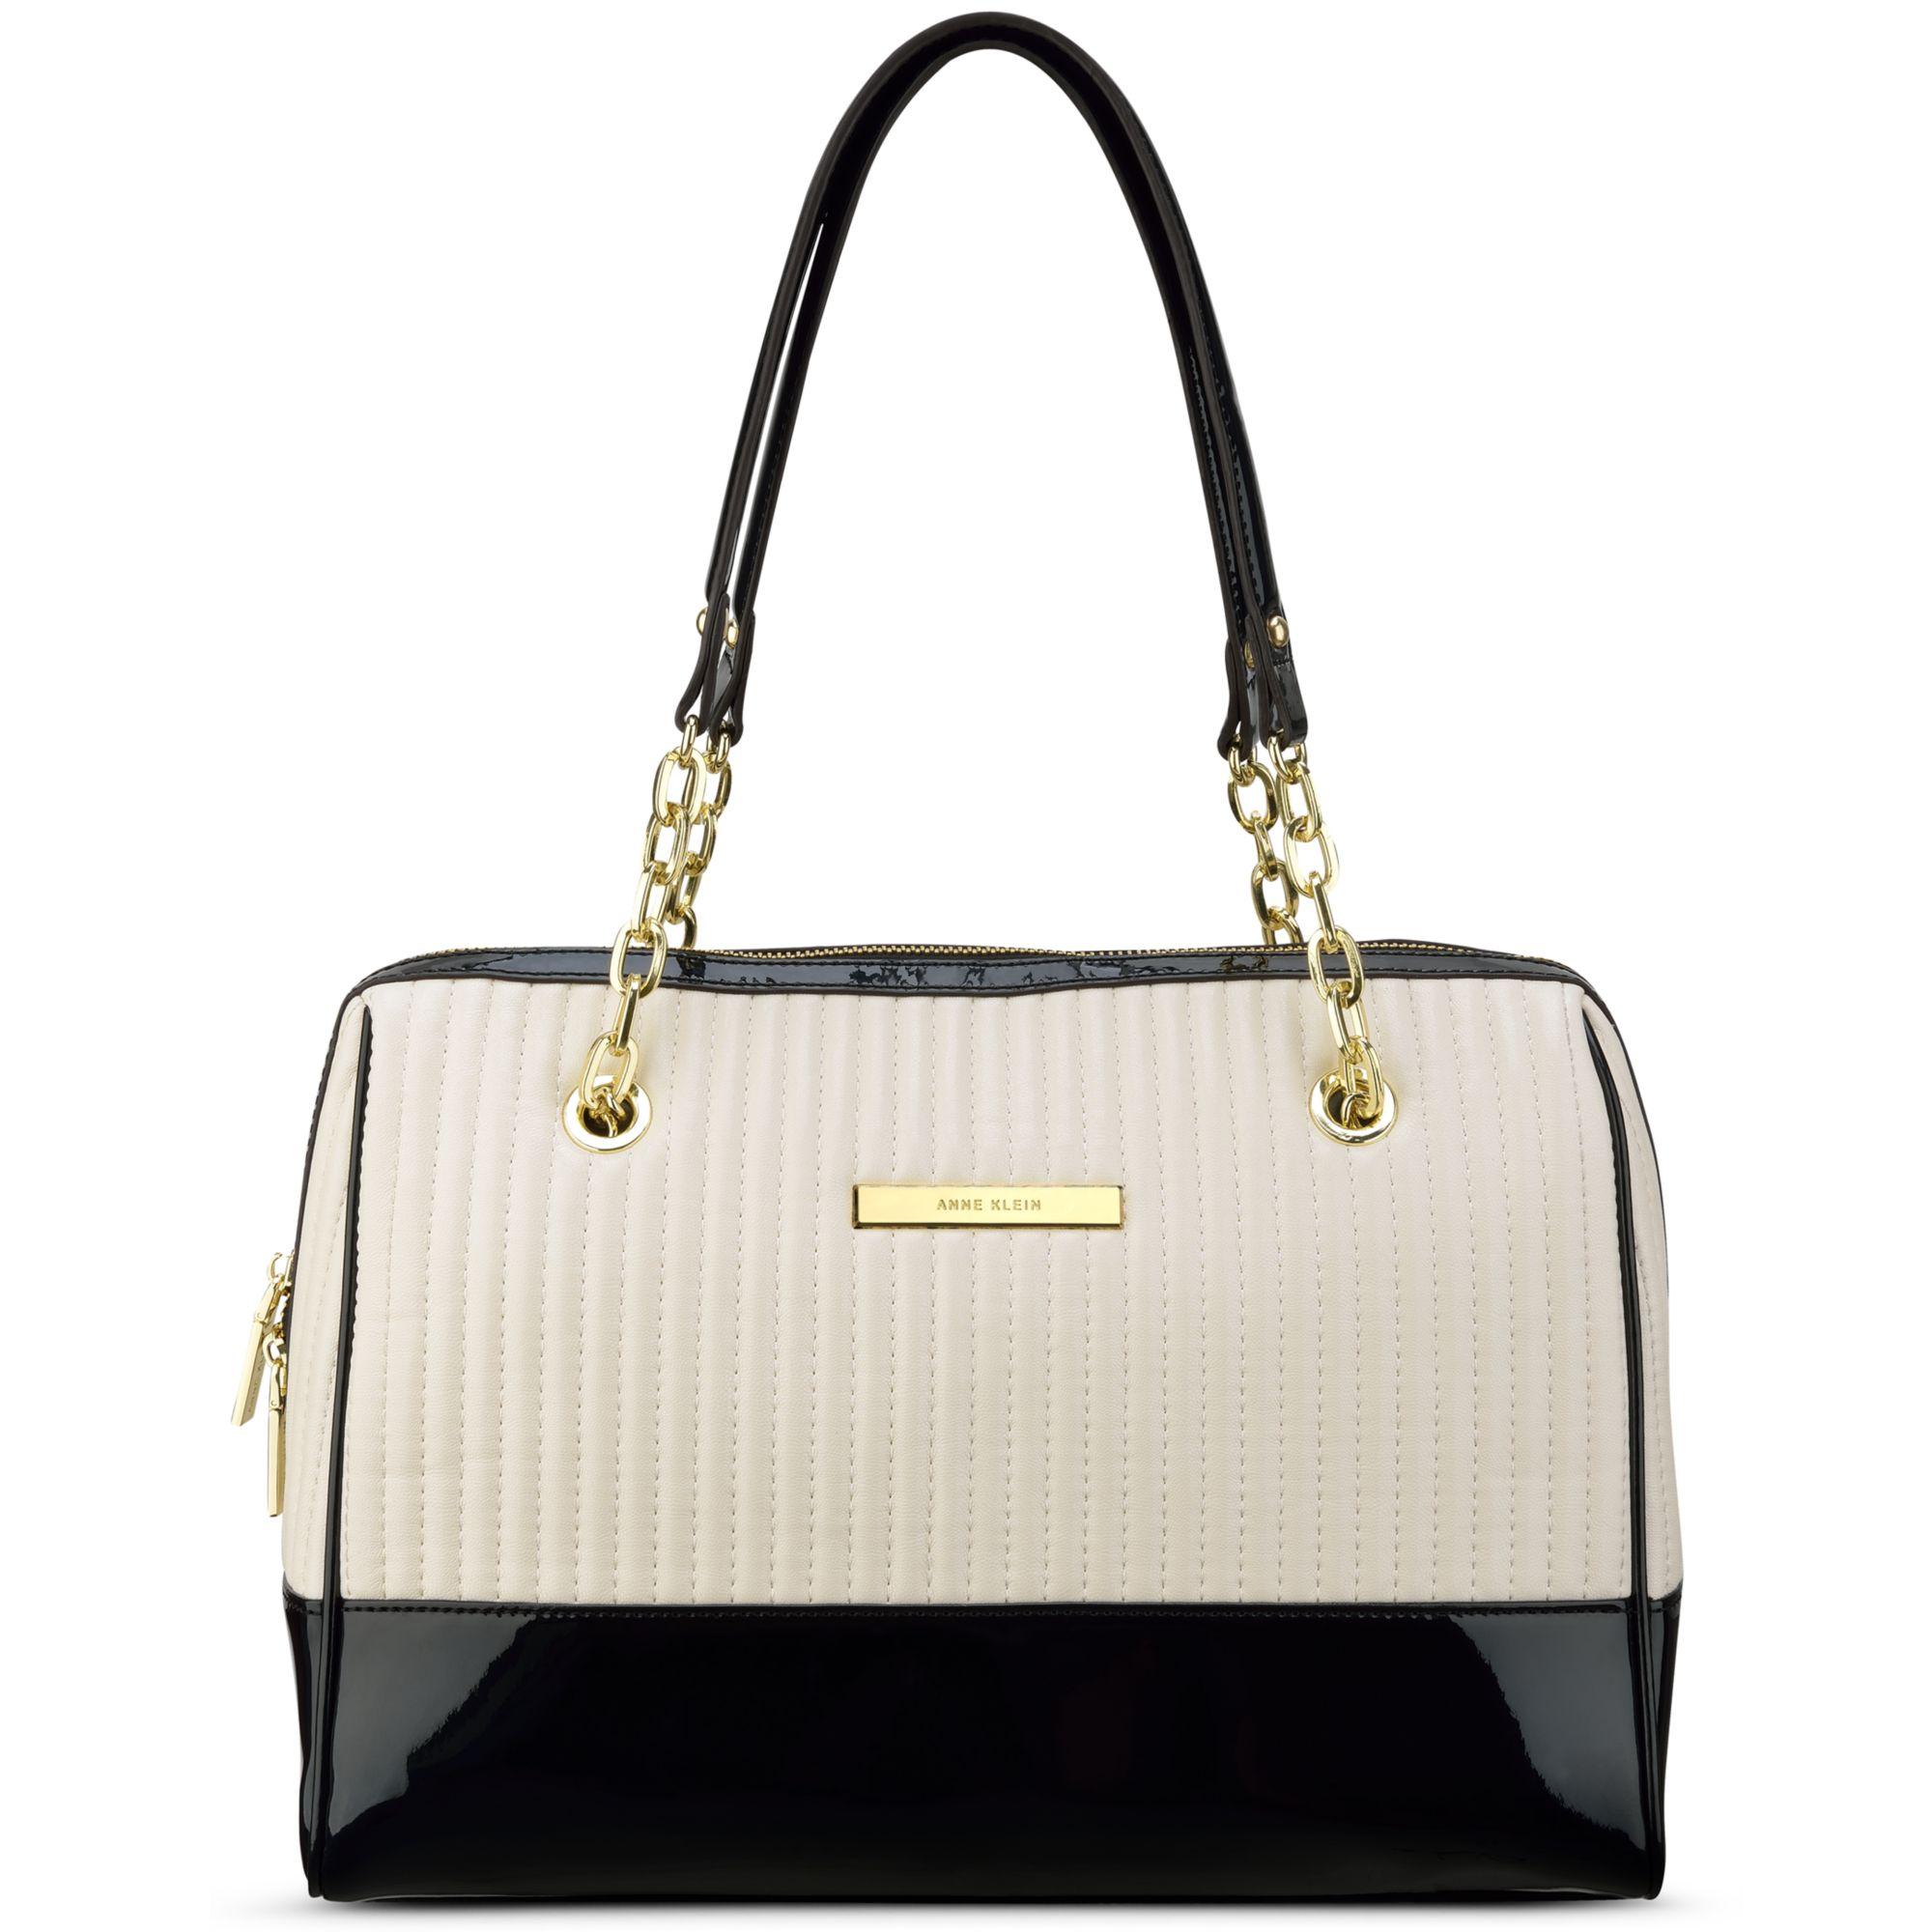 97d8876bdb7 Lyst - Anne Klein Change The Channel Medium Duffle Bag in Black anne klein purses  macys